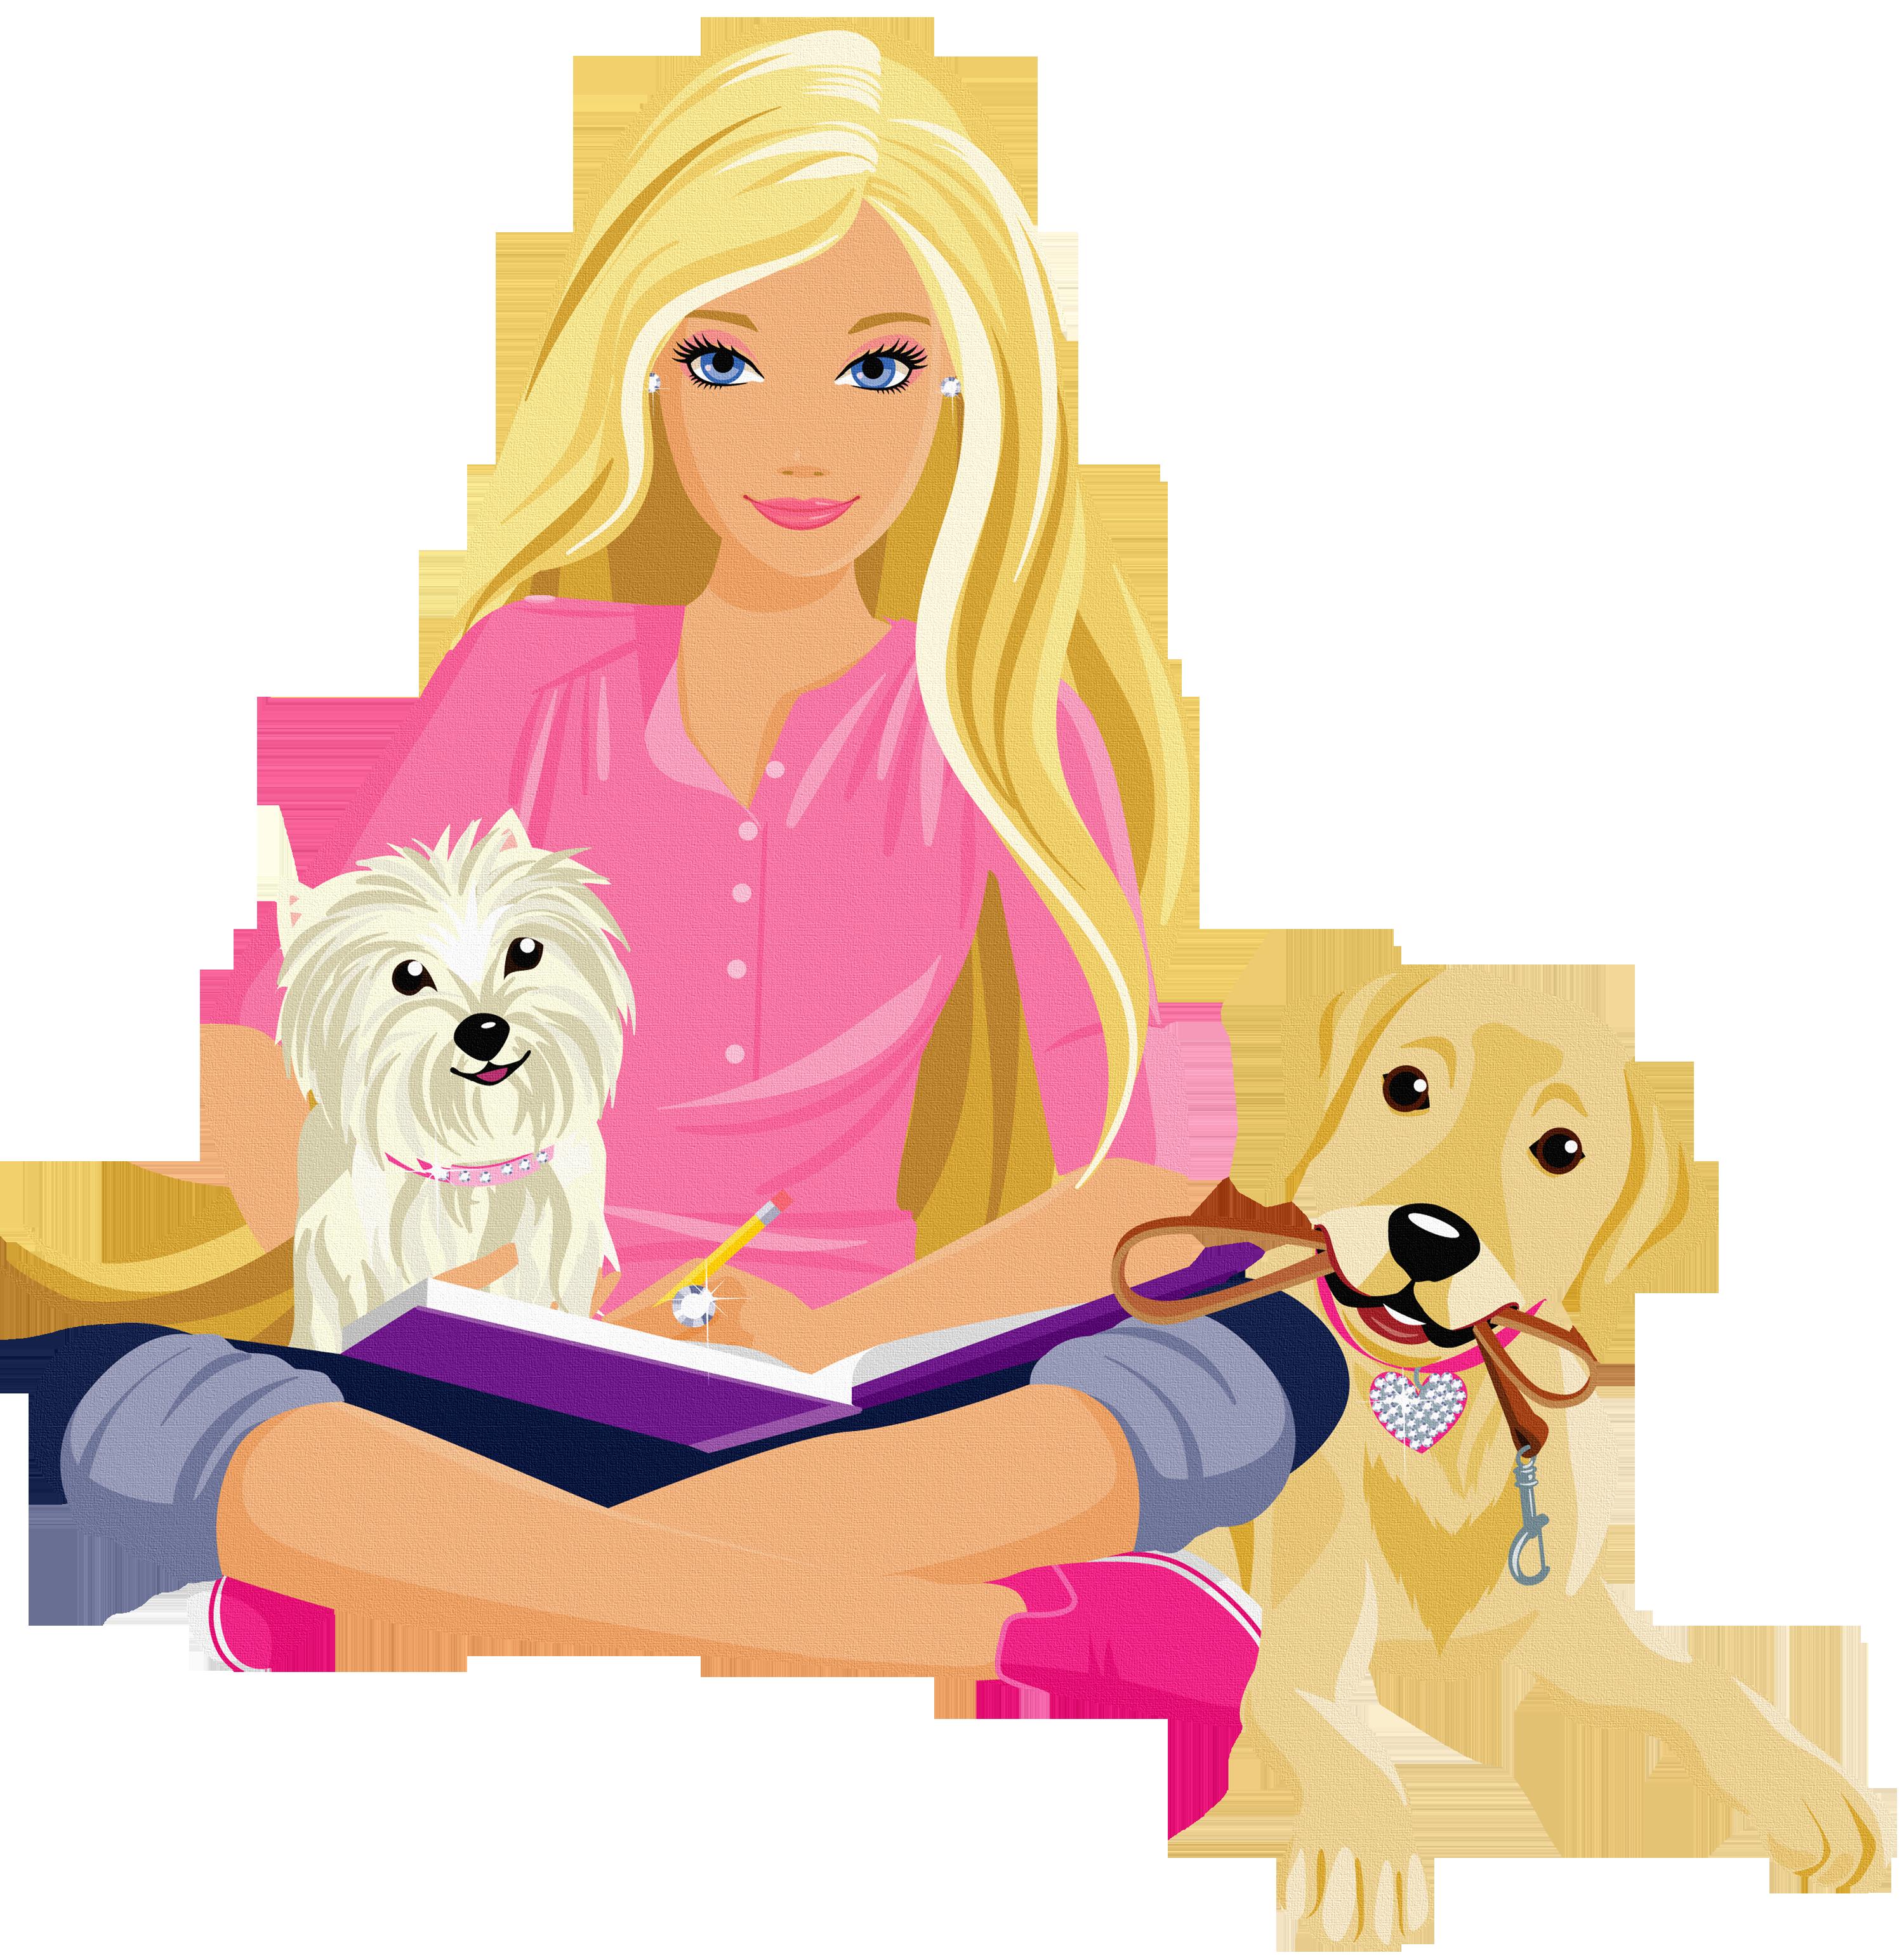 Transparent_Barbie_Clipart.png?mu003d138-Transparent_Barbie_Clipart.png?mu003d1381269600. Barbie Clipart. Barbie Clip Art. Barbie Clipart-18